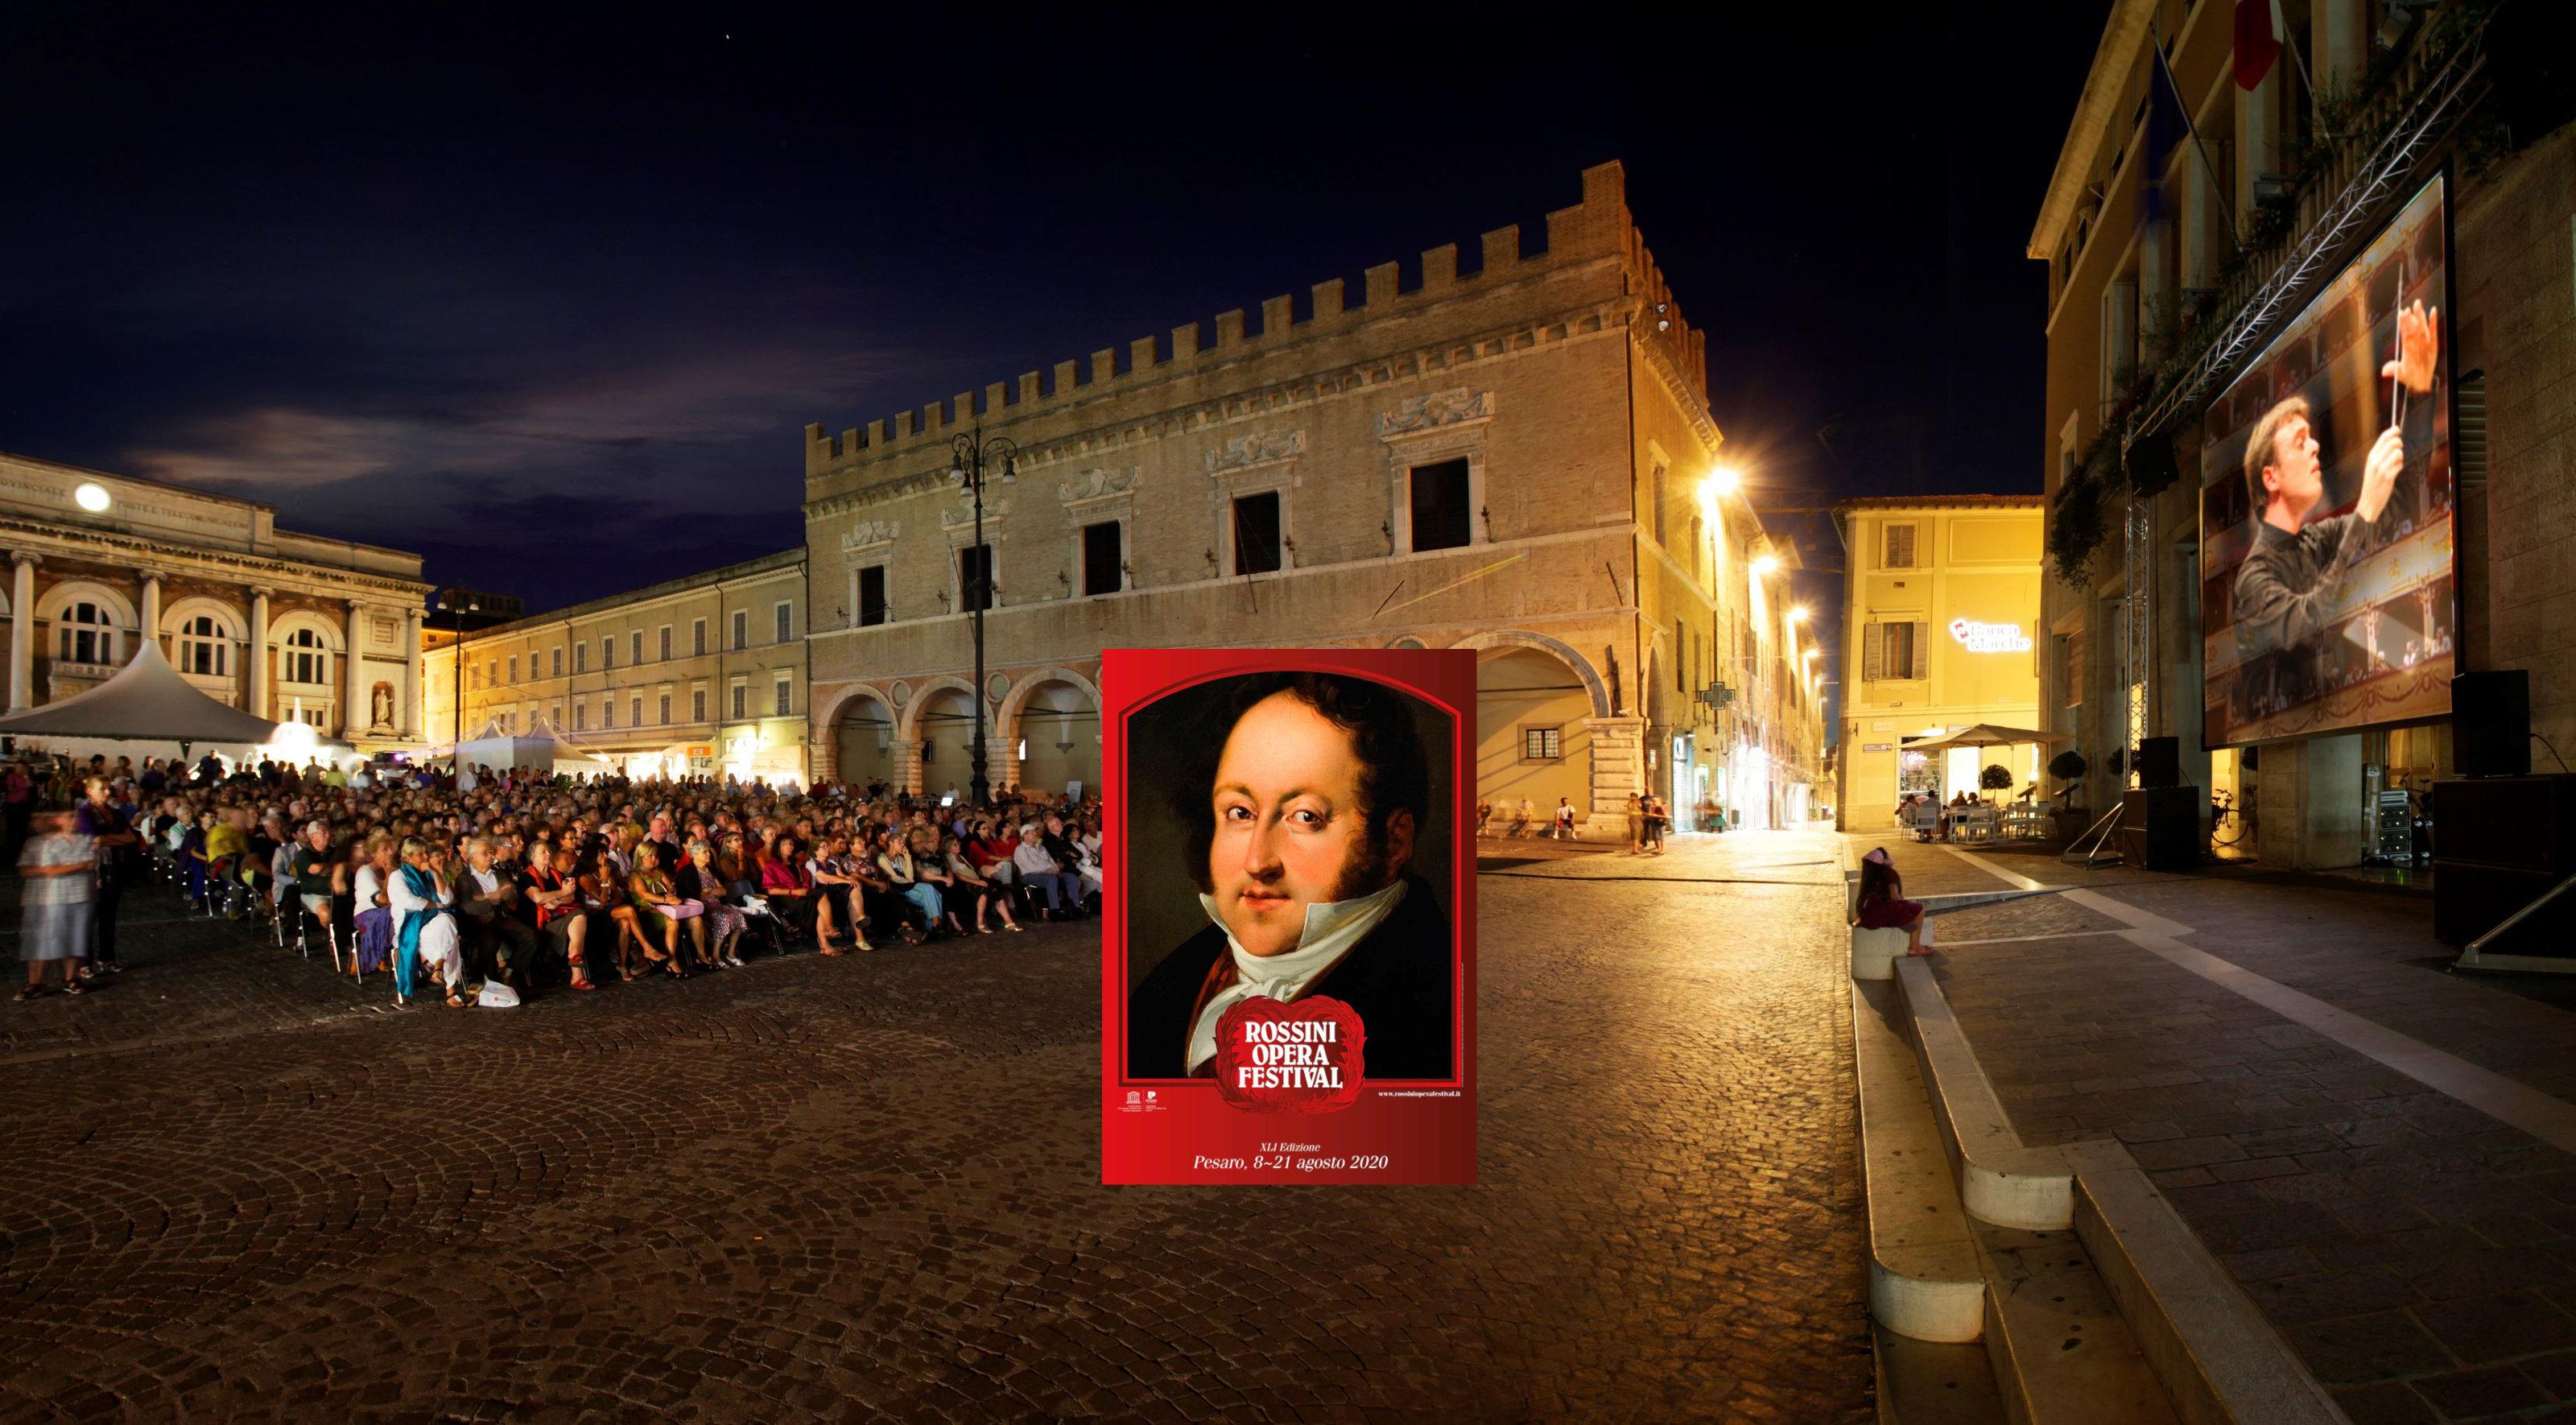 Rossini Opera Festival Pesaro 2020